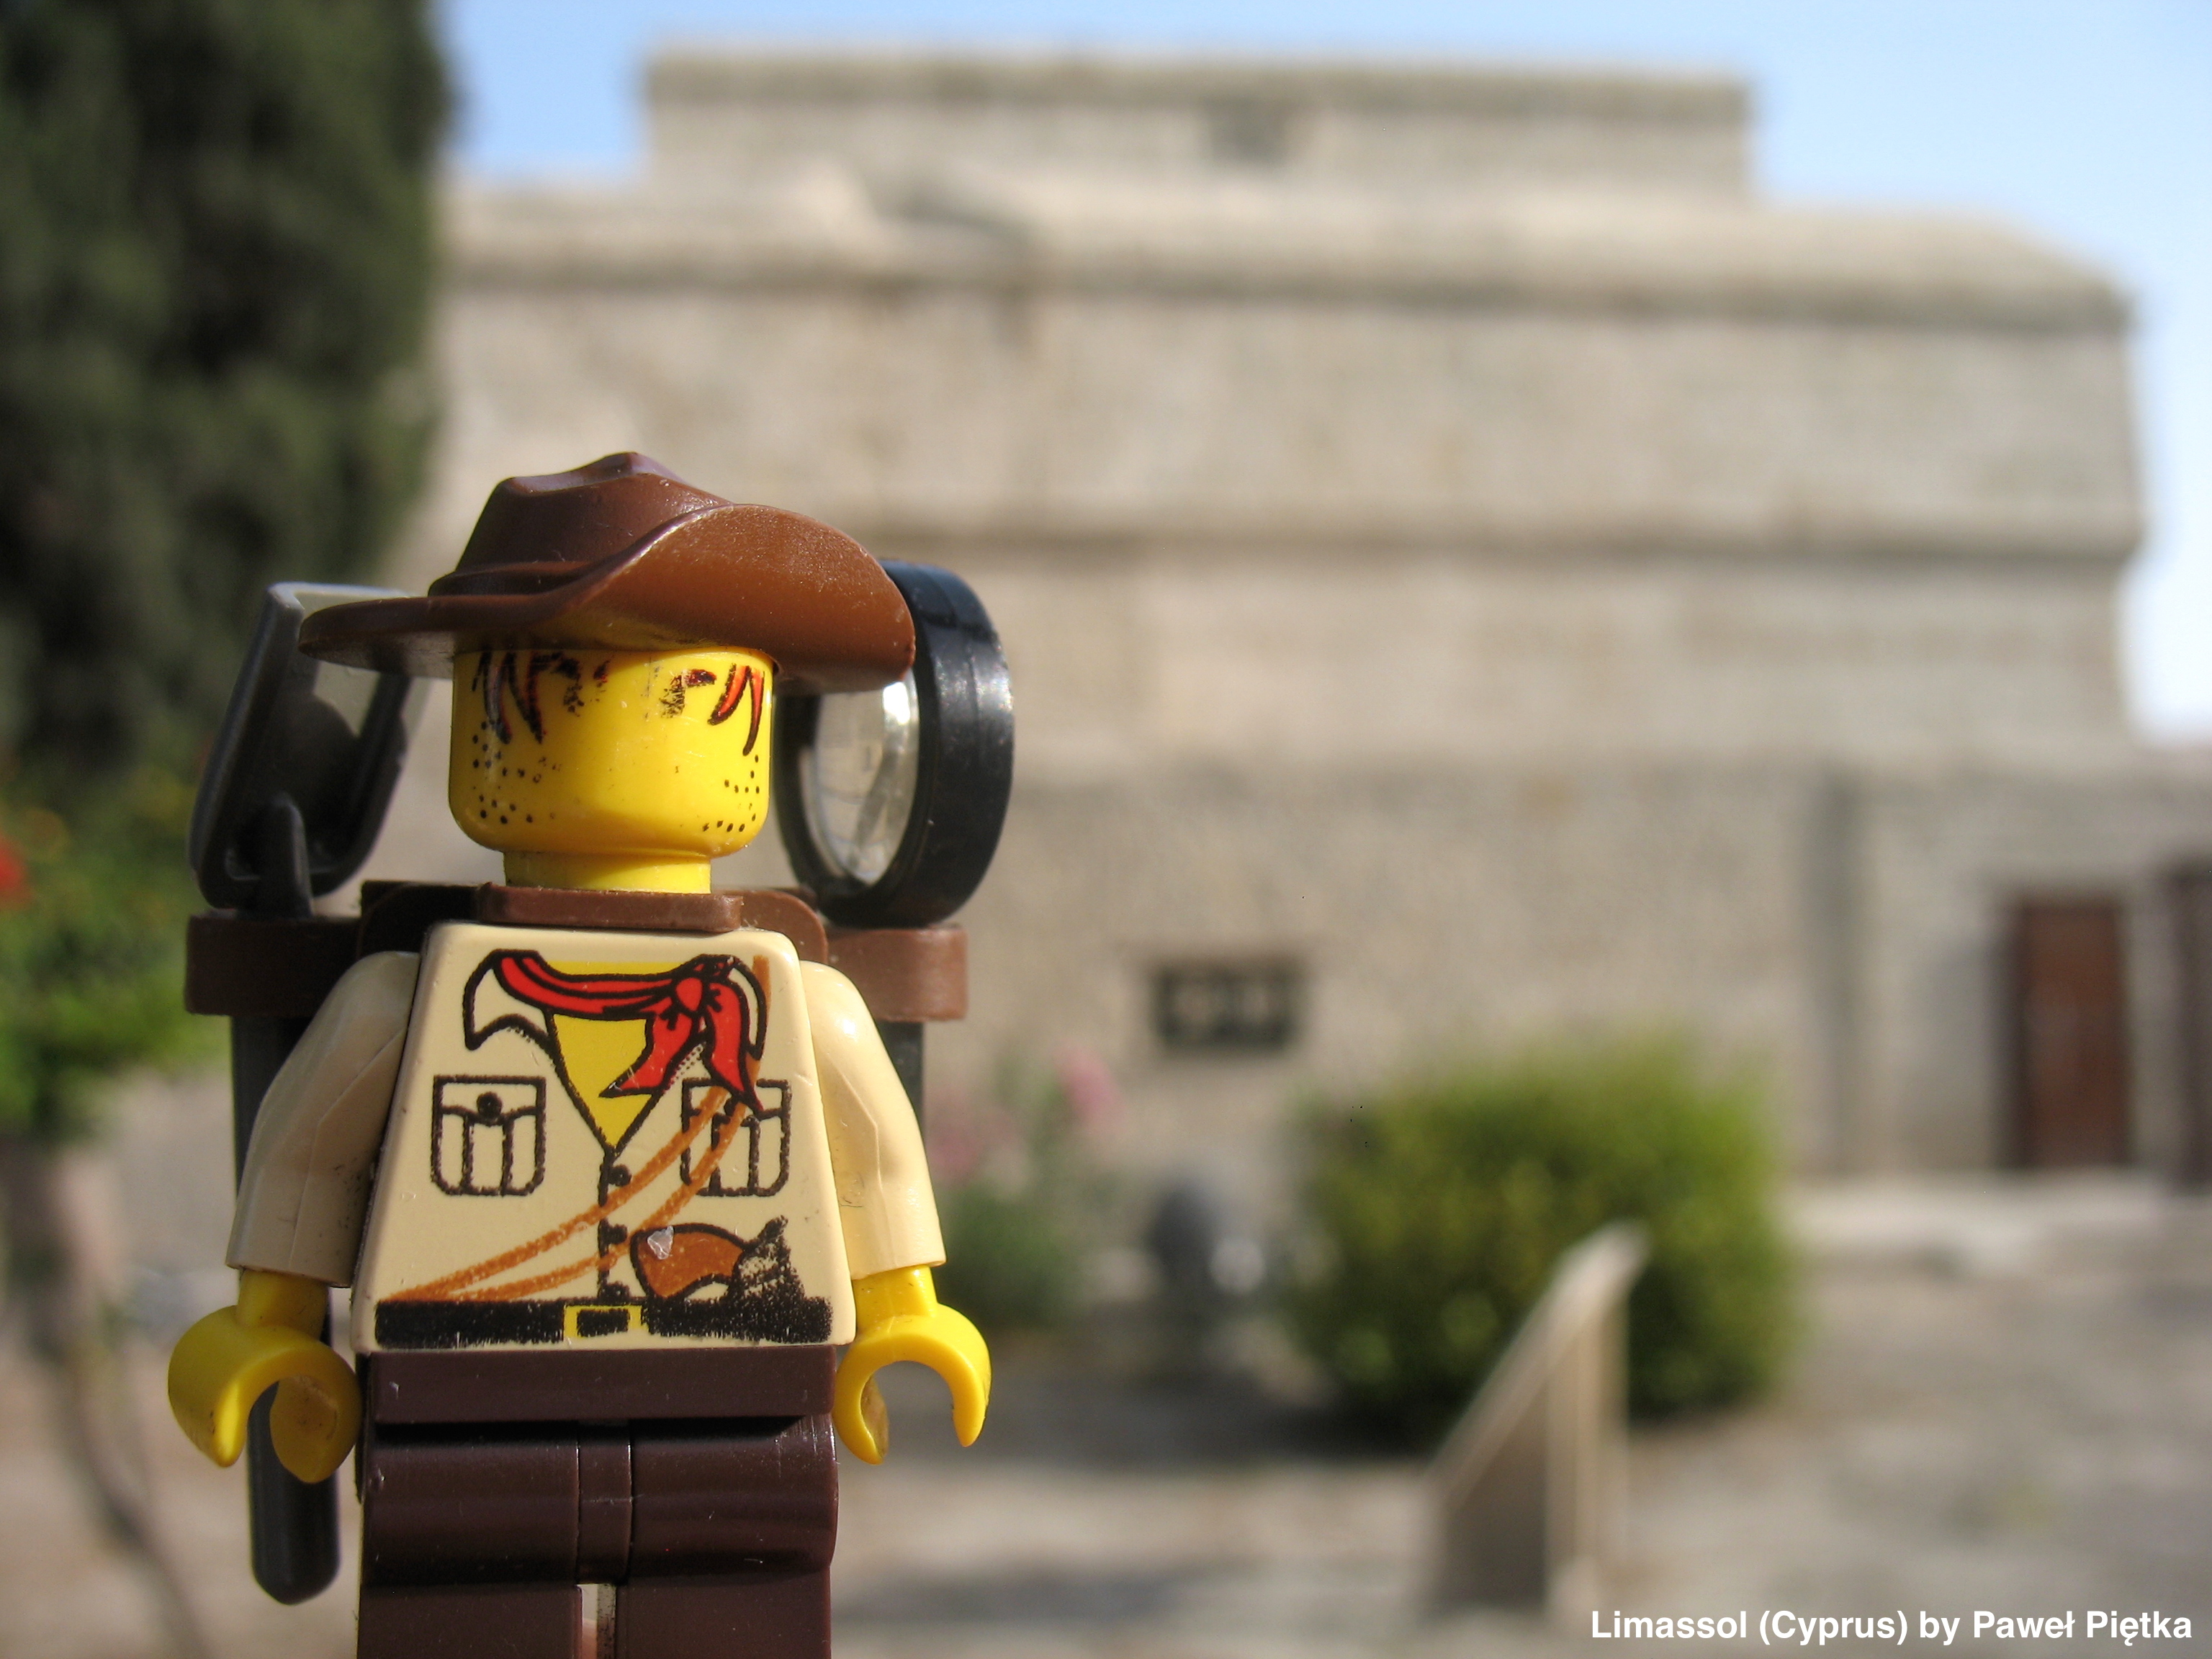 Limassol (Cyprus) - Castle